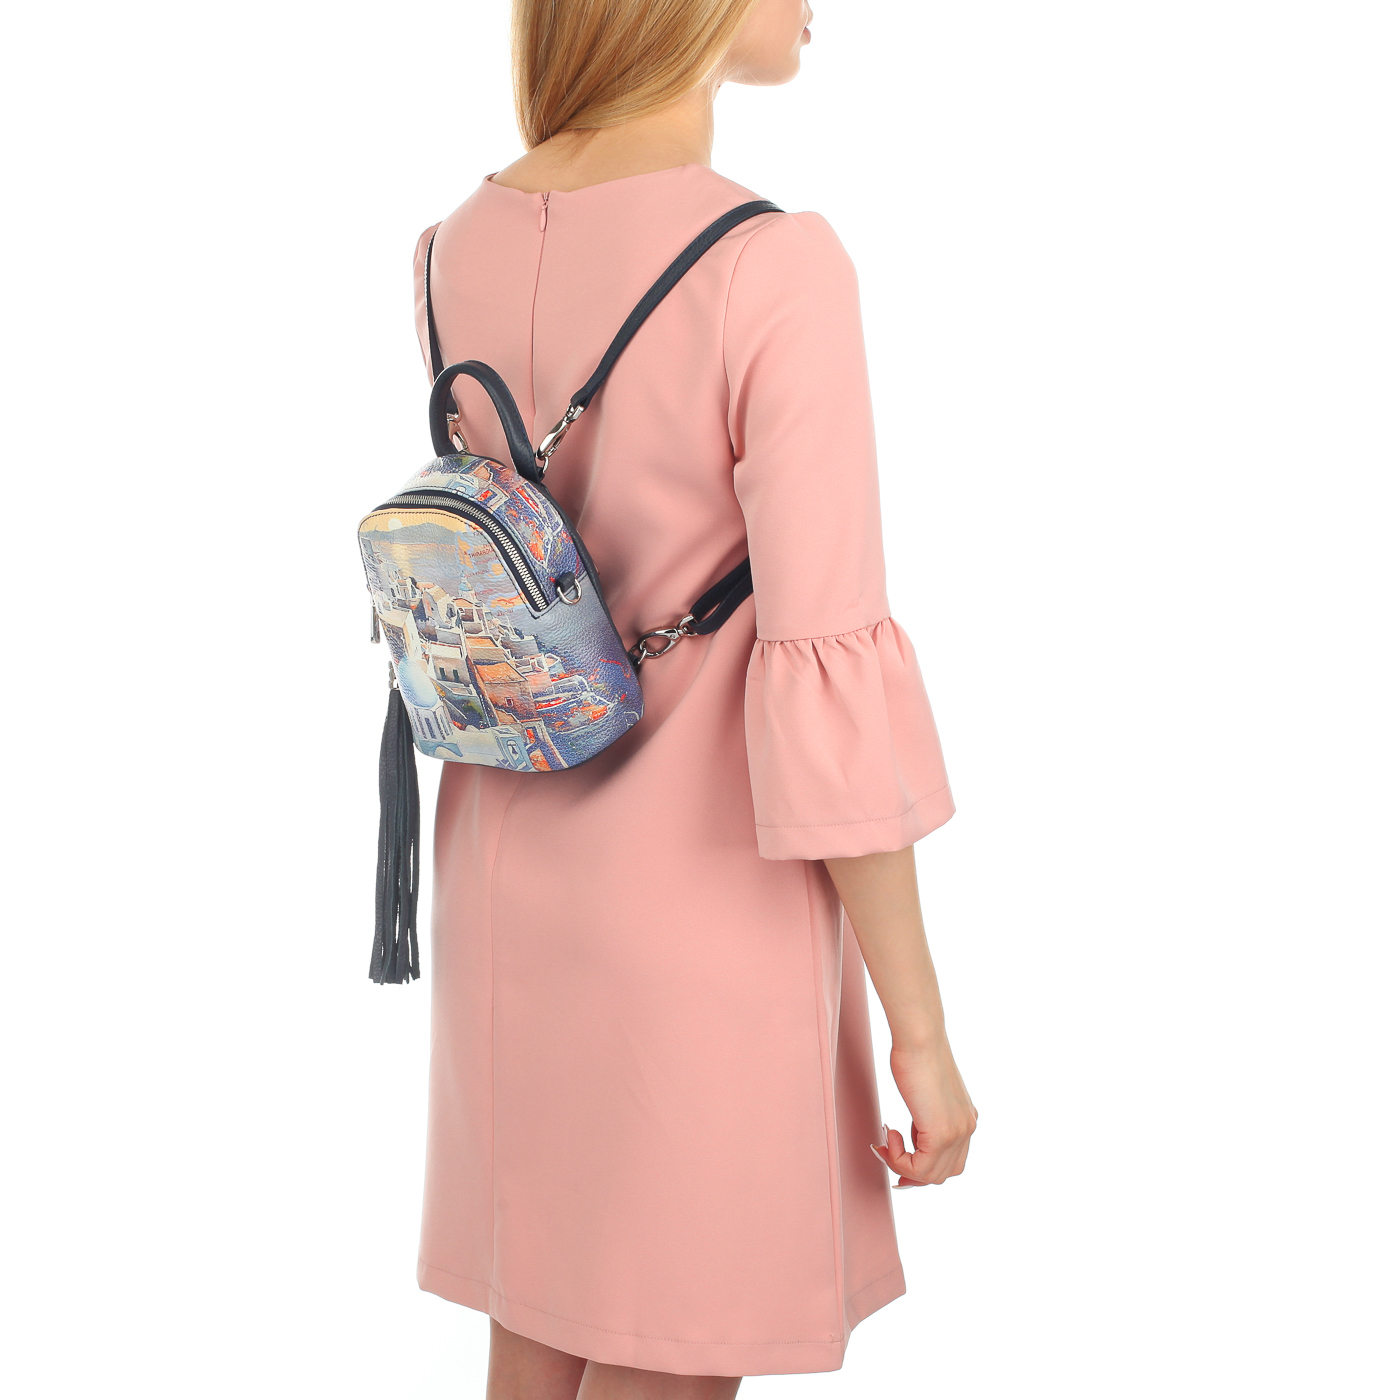 ae37fcf465a7 Женский рюкзак с принтом Chatte FT32702_Santorini orange ...